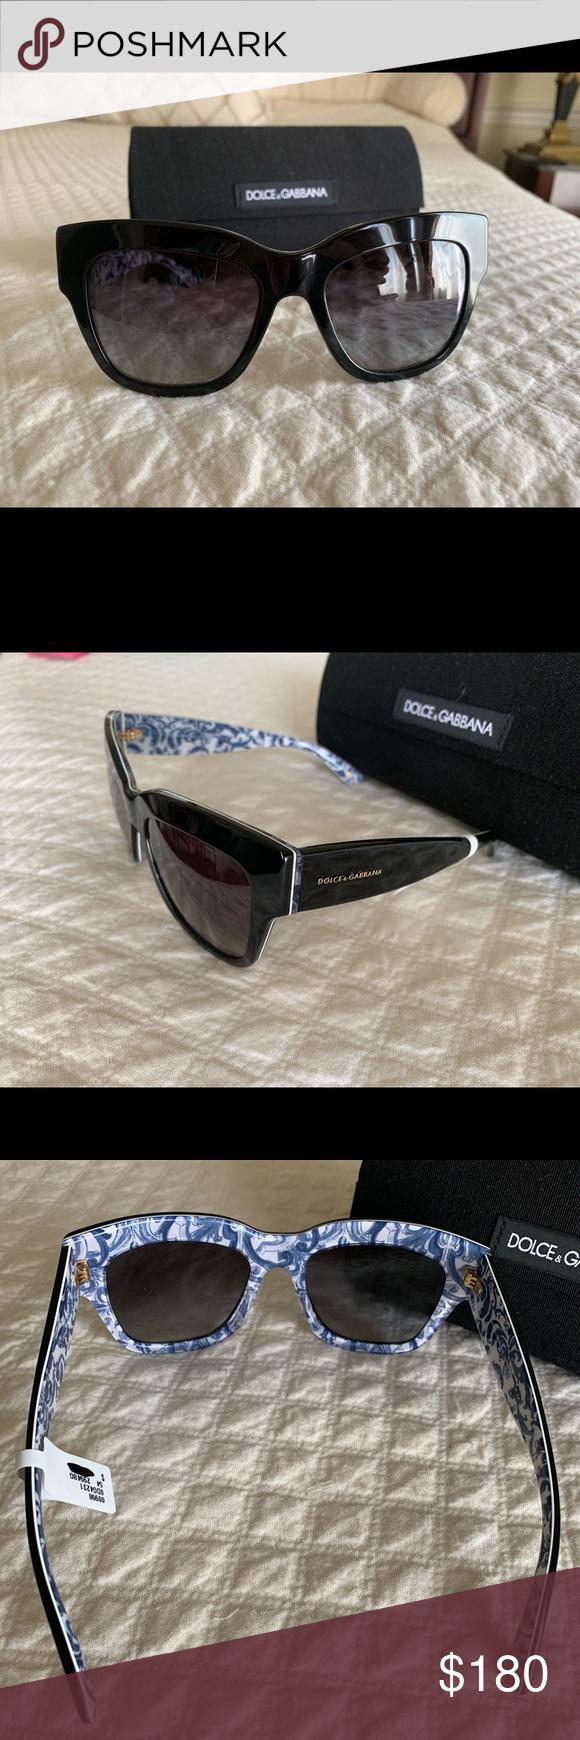 ab85174c286 Dolce Gabbana Sunglasses NWOT New glasses. Never worn. Authentic. Dolce   Gabbana  Accessories